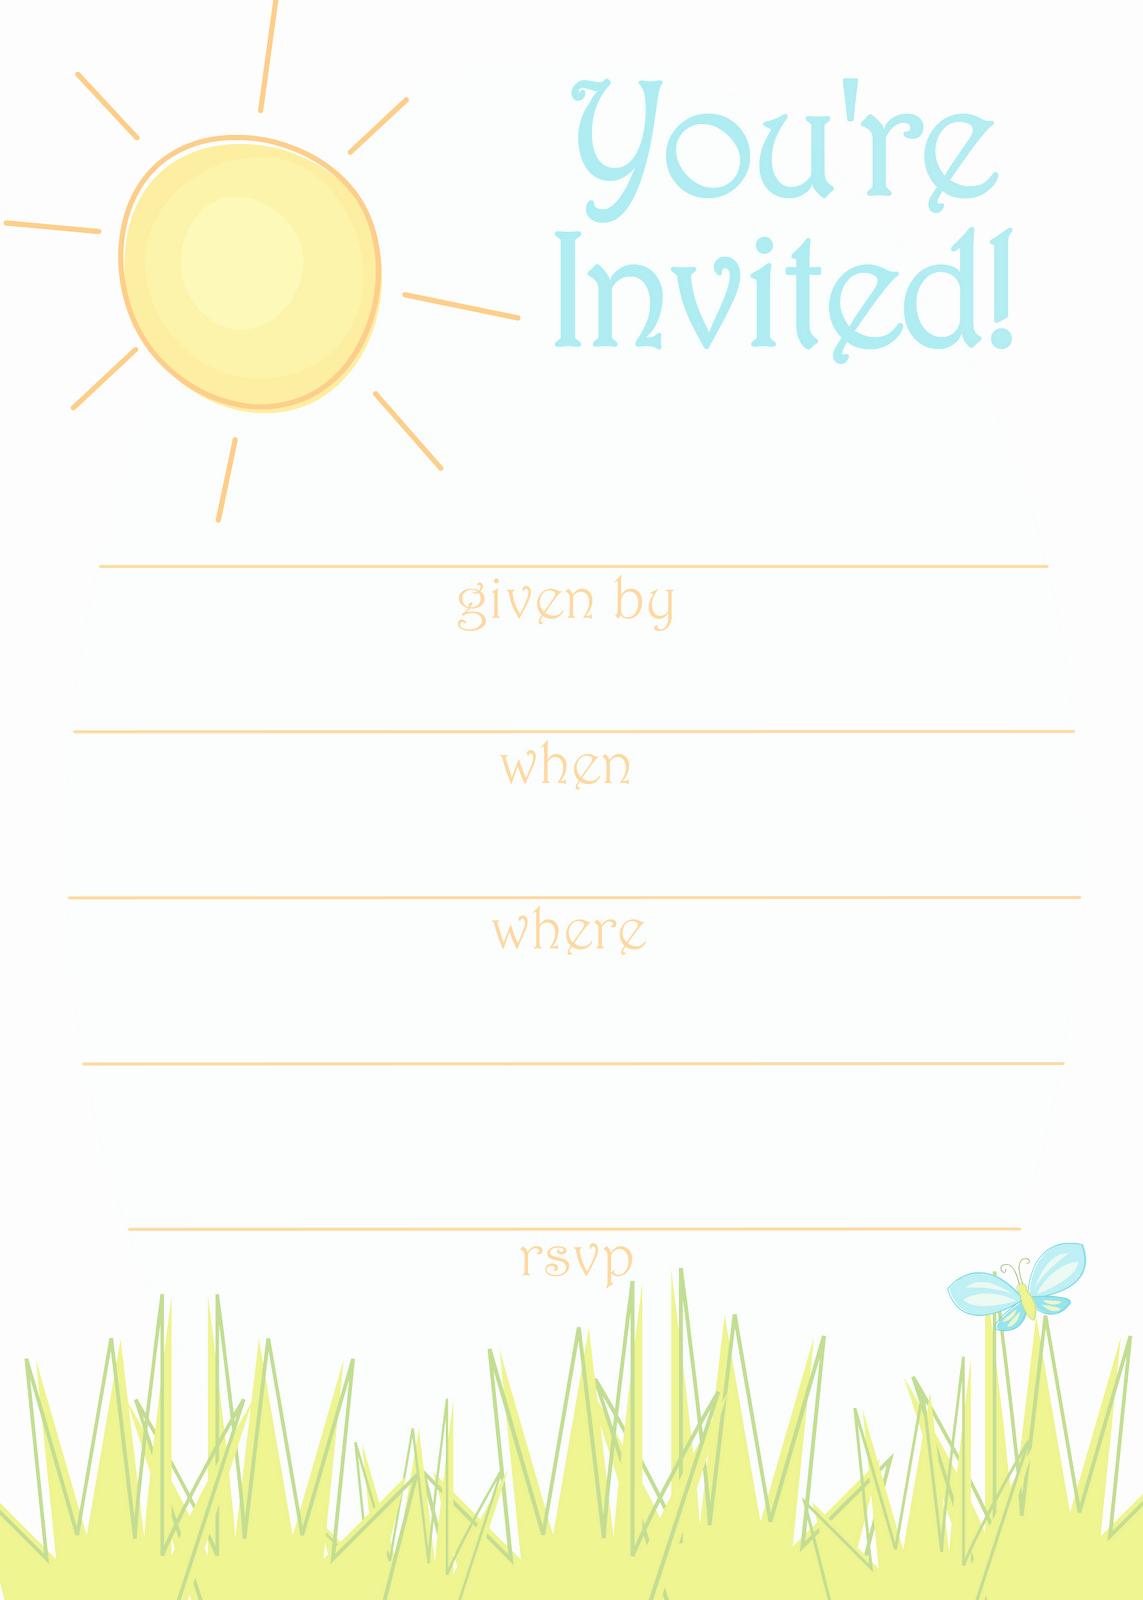 Free Templates for Birthday Invitations Luxury Free Party Invitation Templates